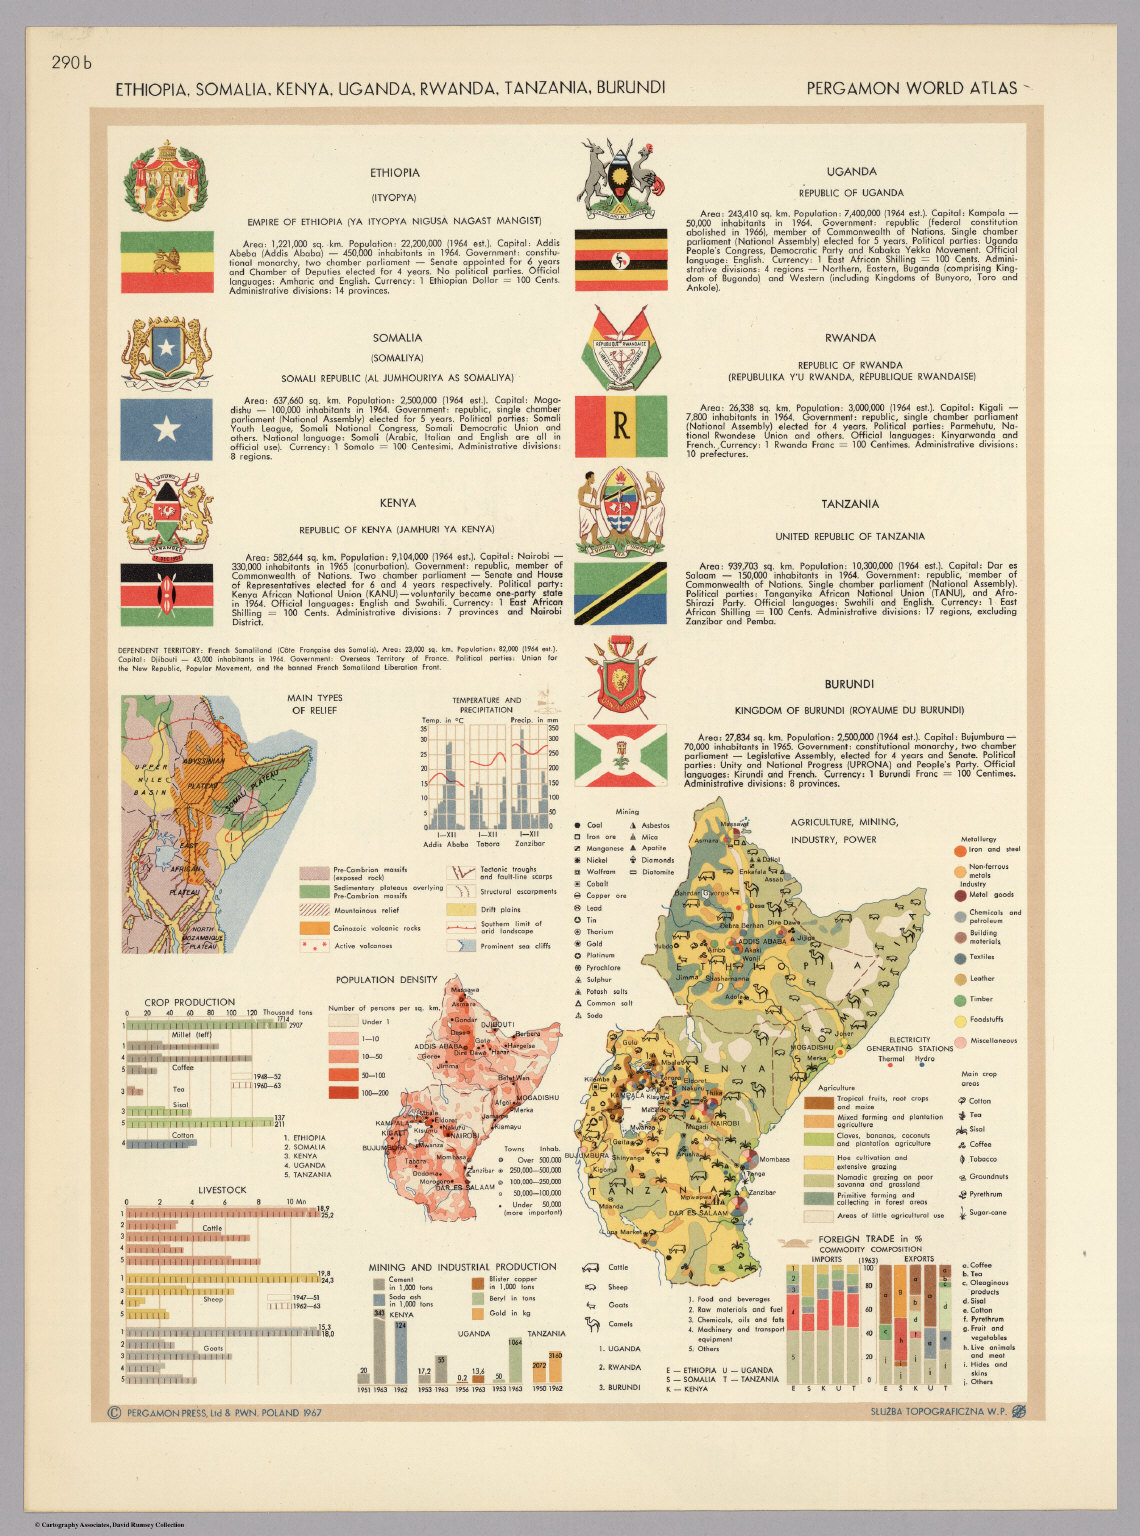 Ethiopia somalia kenya uganda rwanda tanzania burundi ethiopia somalia kenya uganda rwanda tanzania burundi pergamon world atlas gumiabroncs Image collections